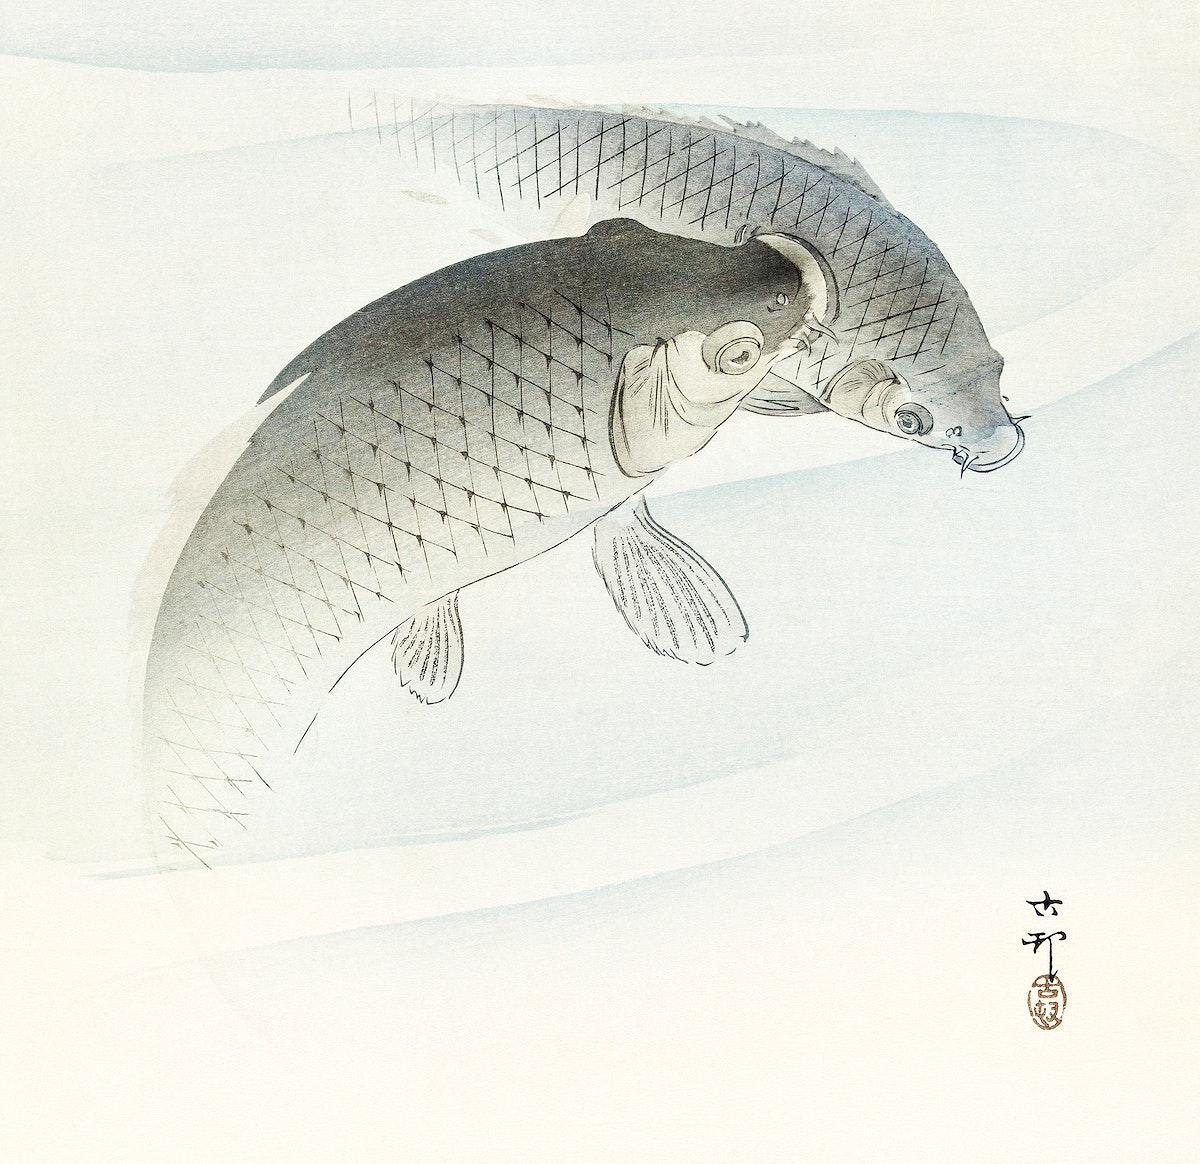 Two carp fish (1900 - 1910) by Ohara Koson (1877-1945). Original from The Rijksmuseum. Digitally enhanced by rawpixel.